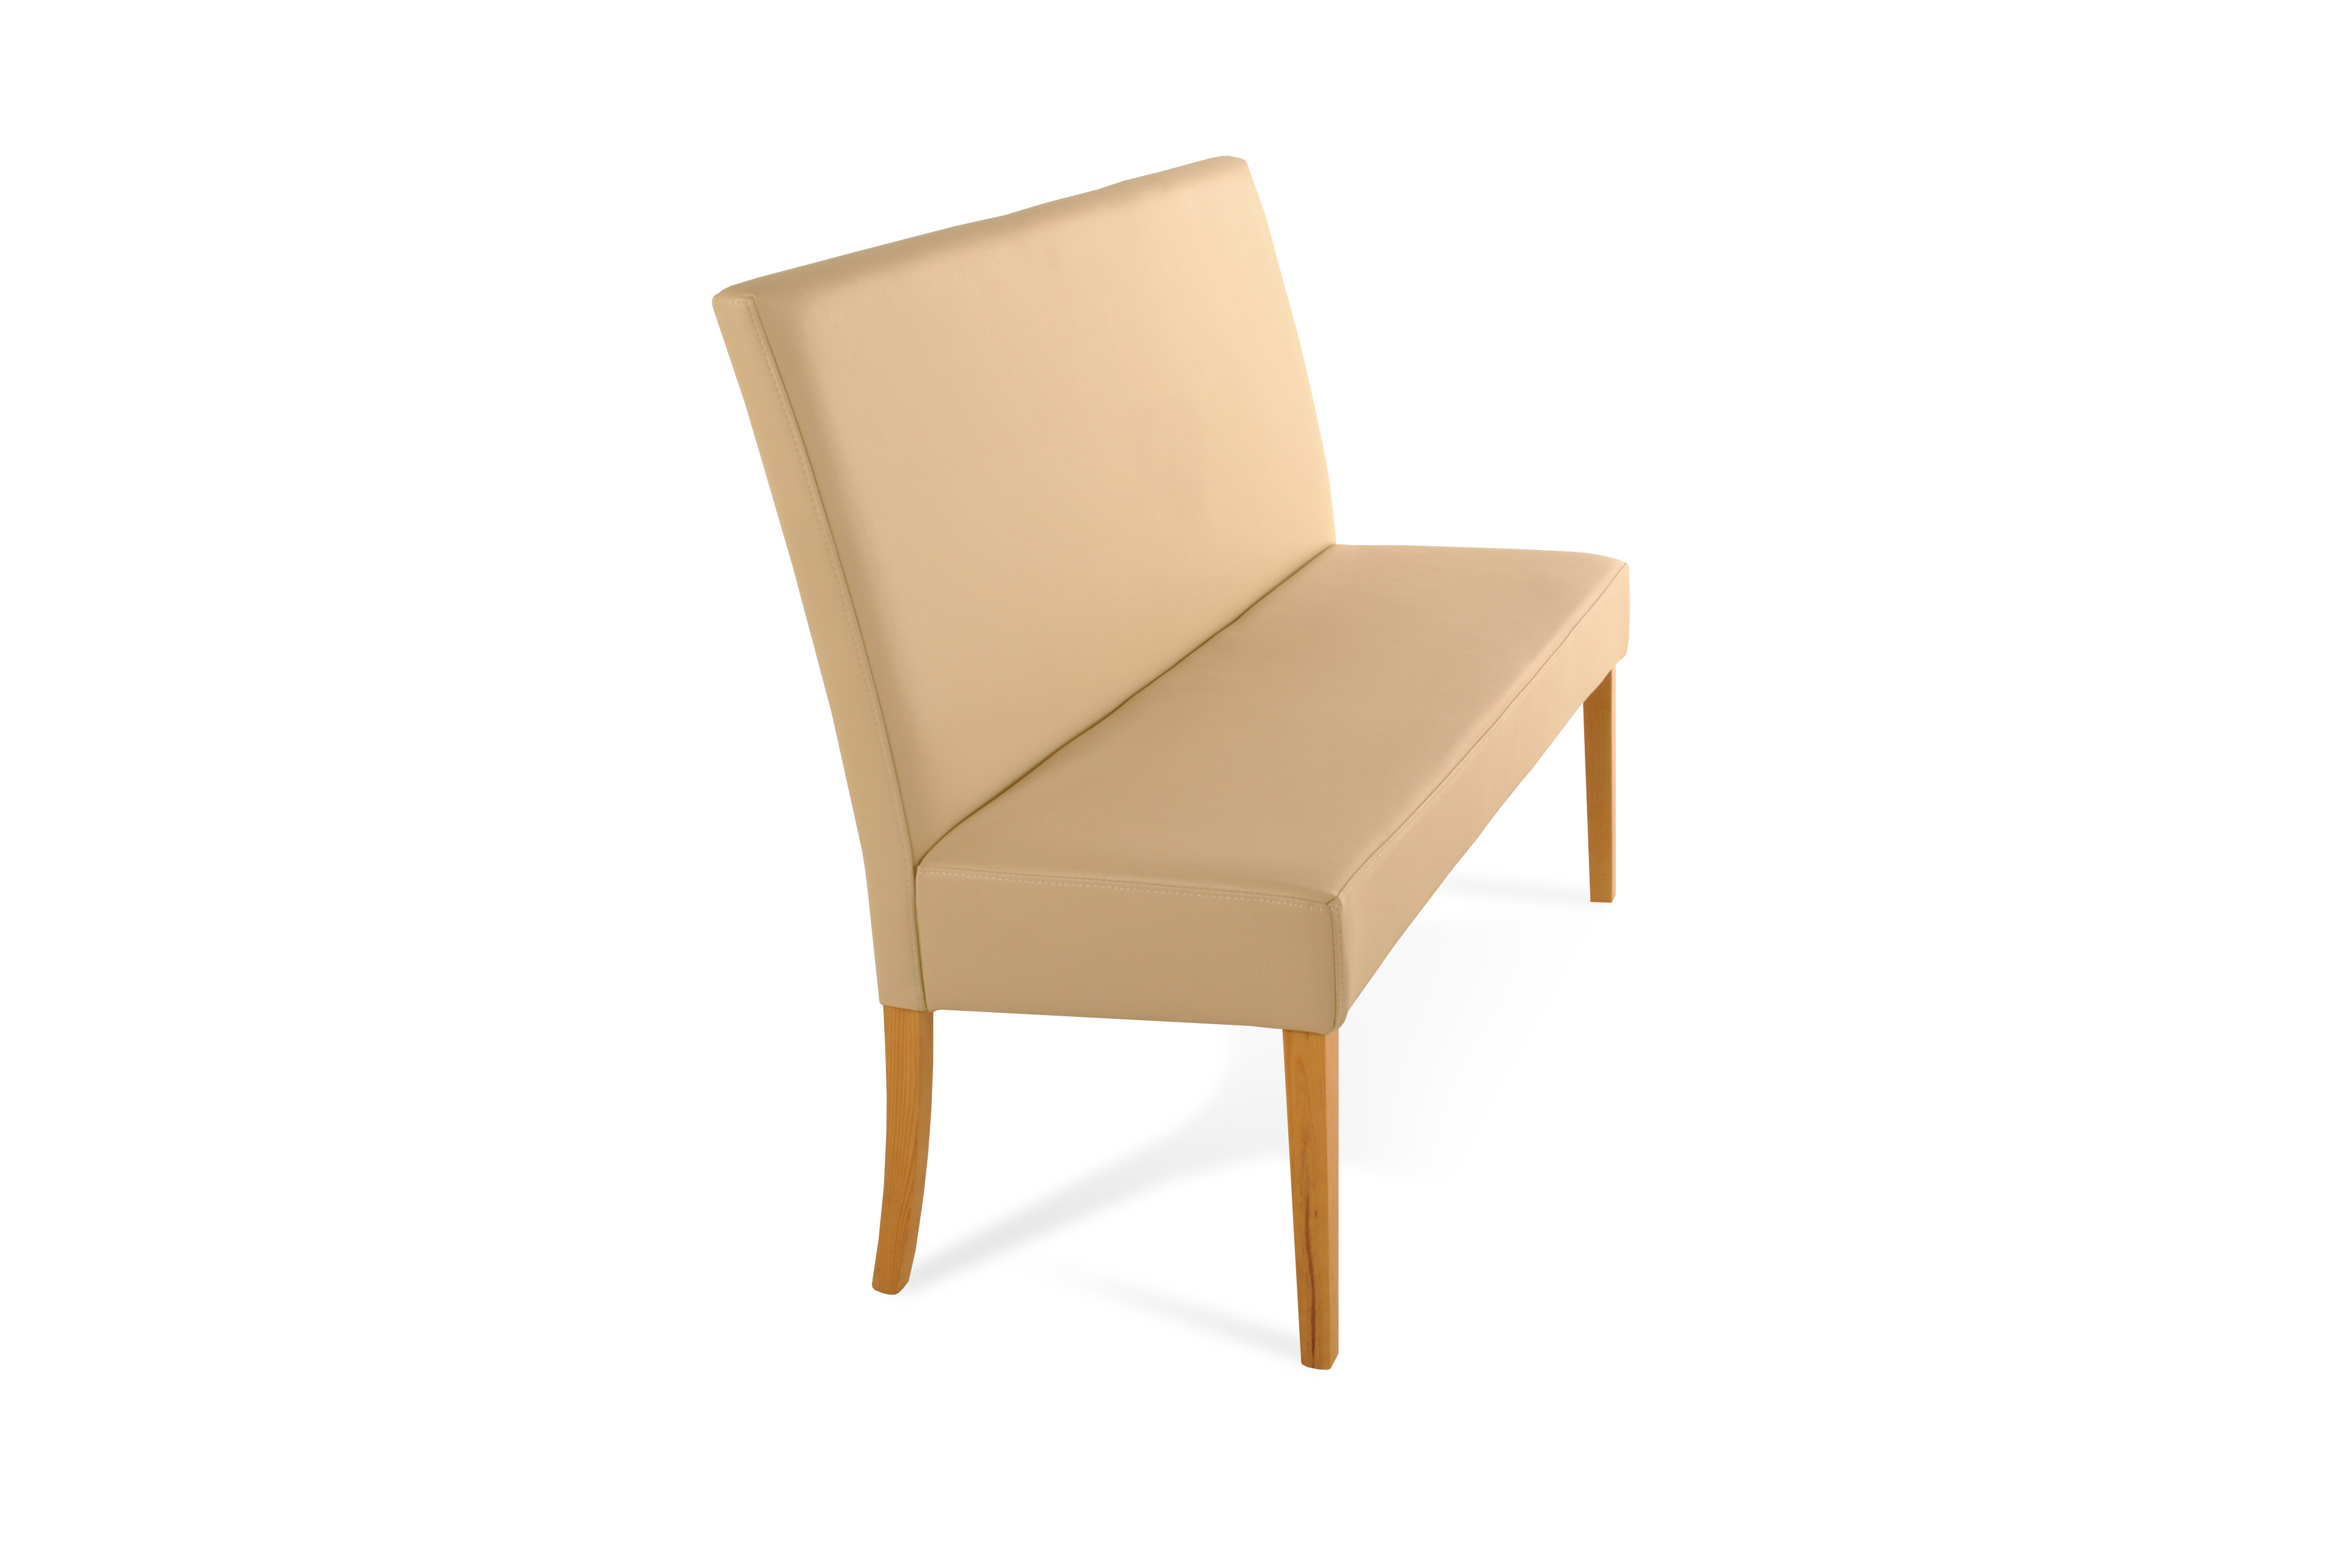 sam sitzbank mit r ckenlehne 200 cm bank essbank creme roma. Black Bedroom Furniture Sets. Home Design Ideas